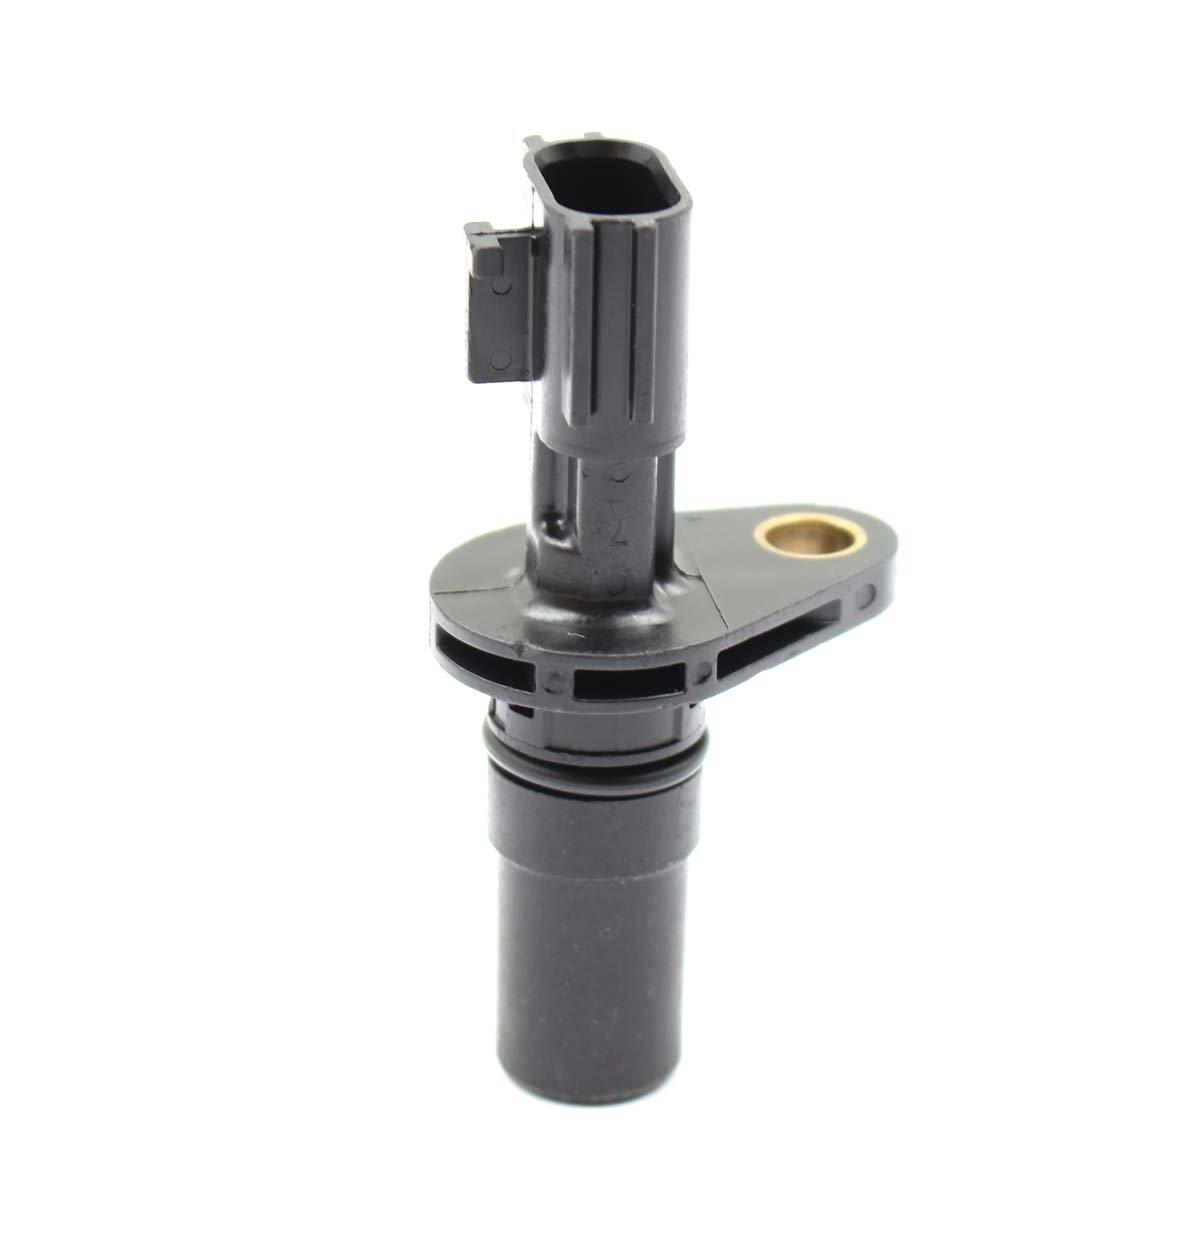 GooDeal Transmission Speed Sensor 31935-1XF01 for Nissan Altima Juke NV Sentra Versa